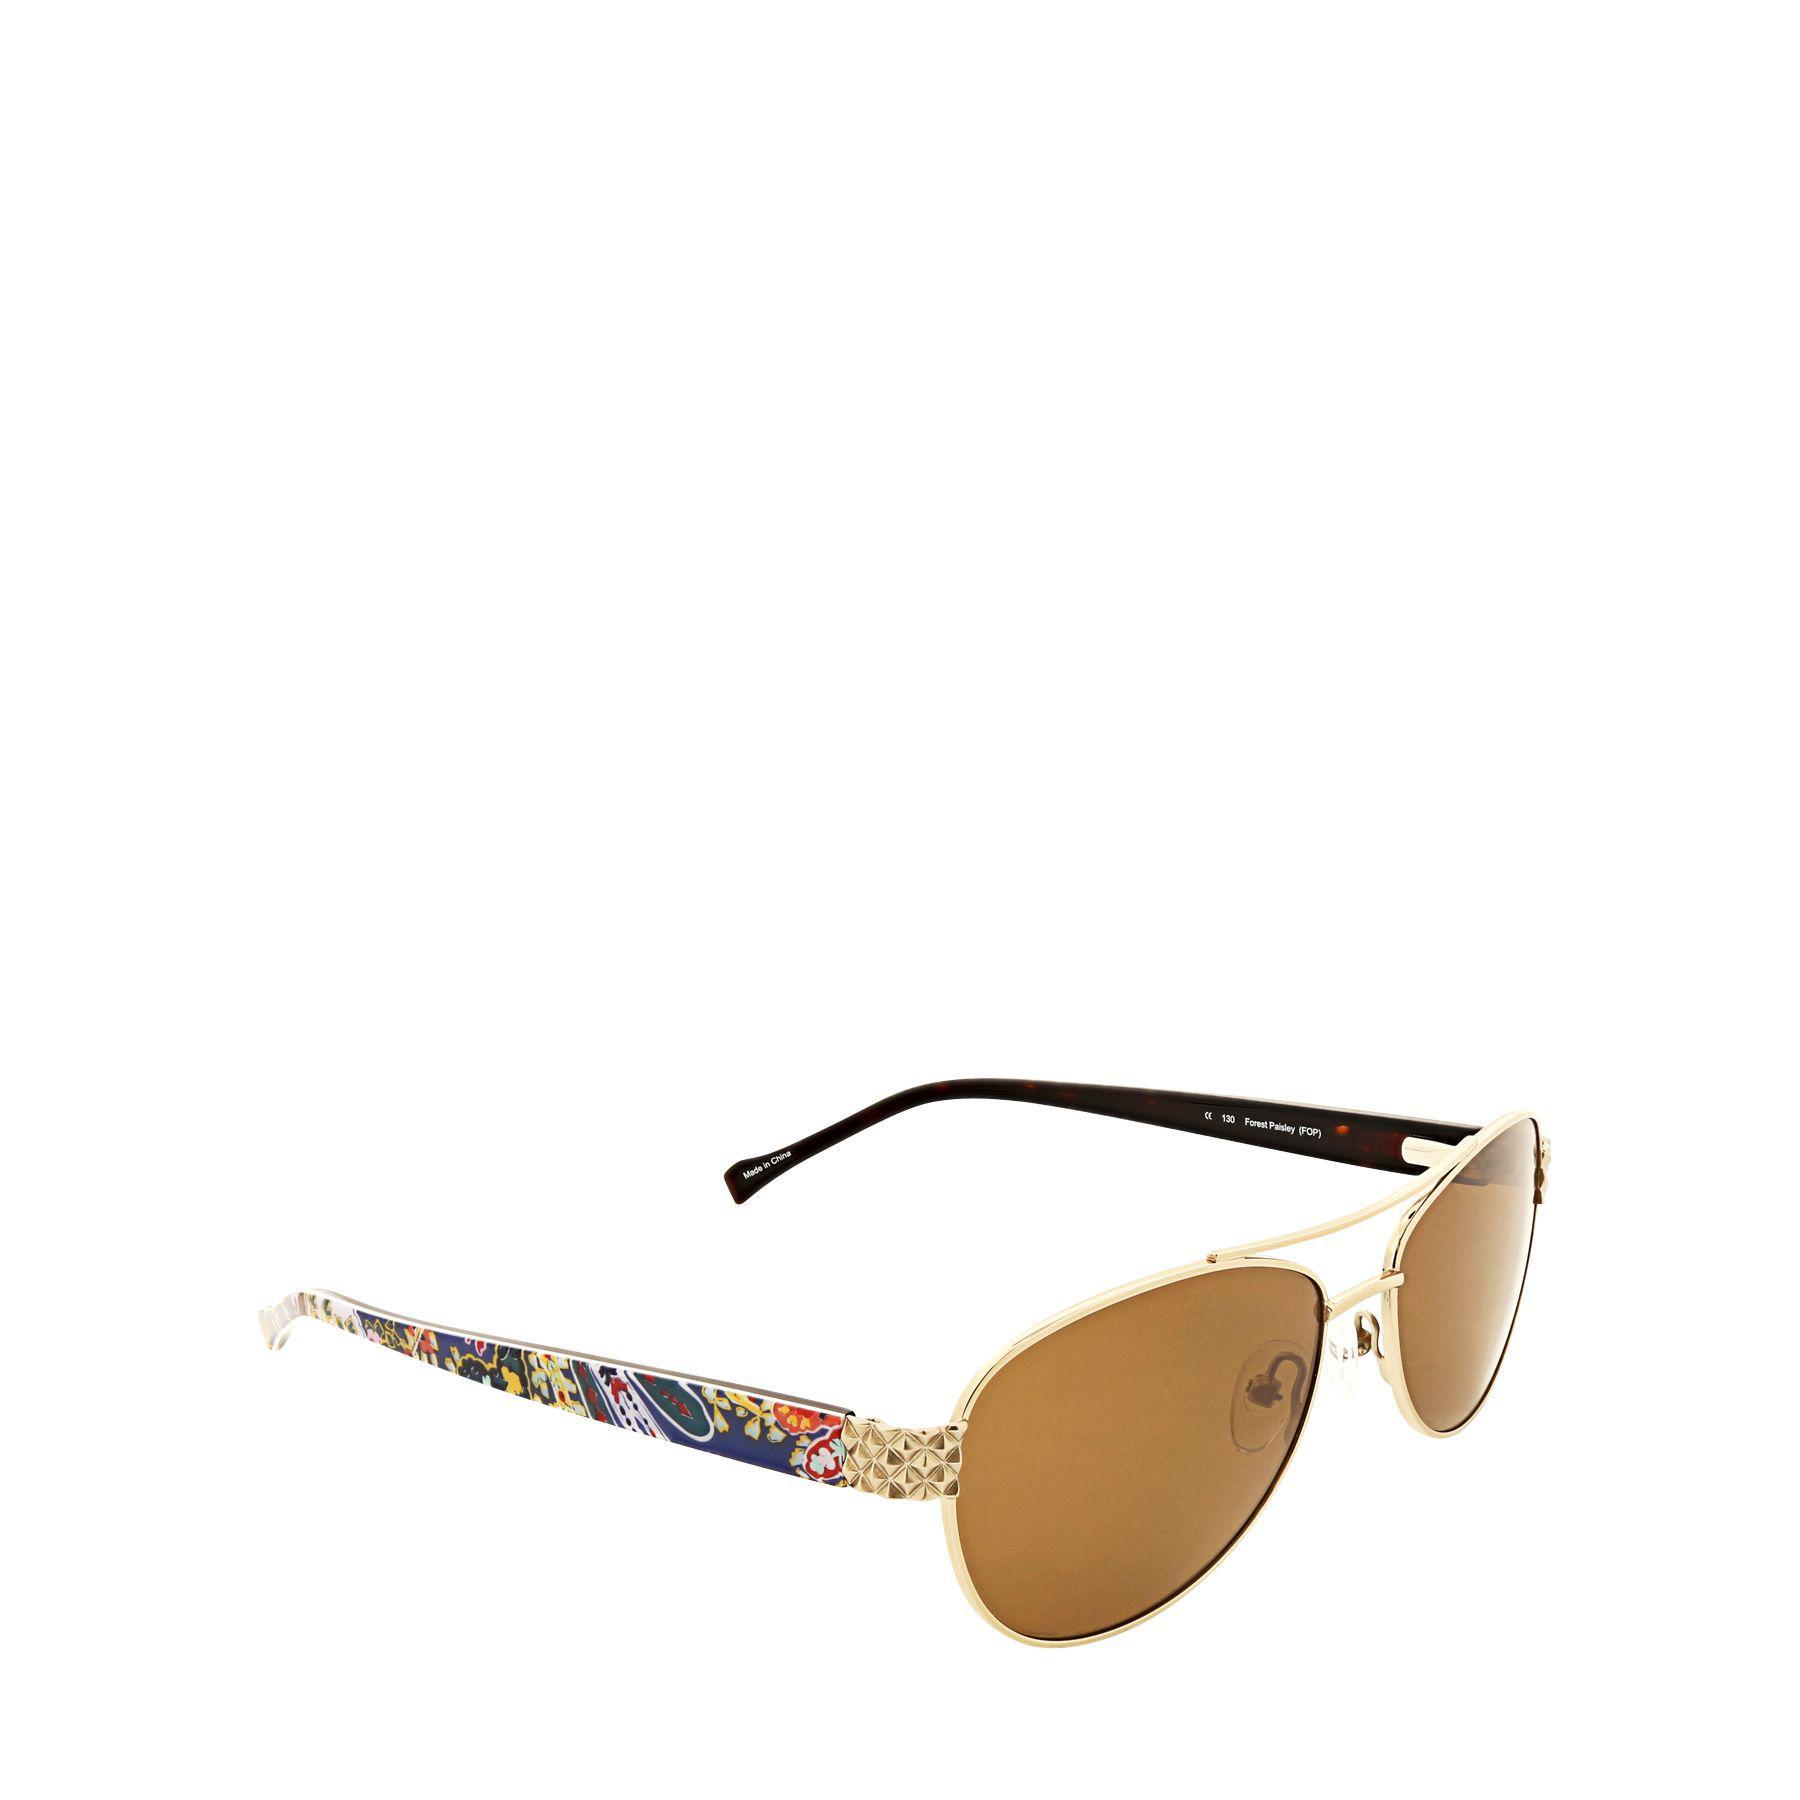 c81342d37 Vera Bradley Marlene Polarized Aviator Sunglasses - Lyst